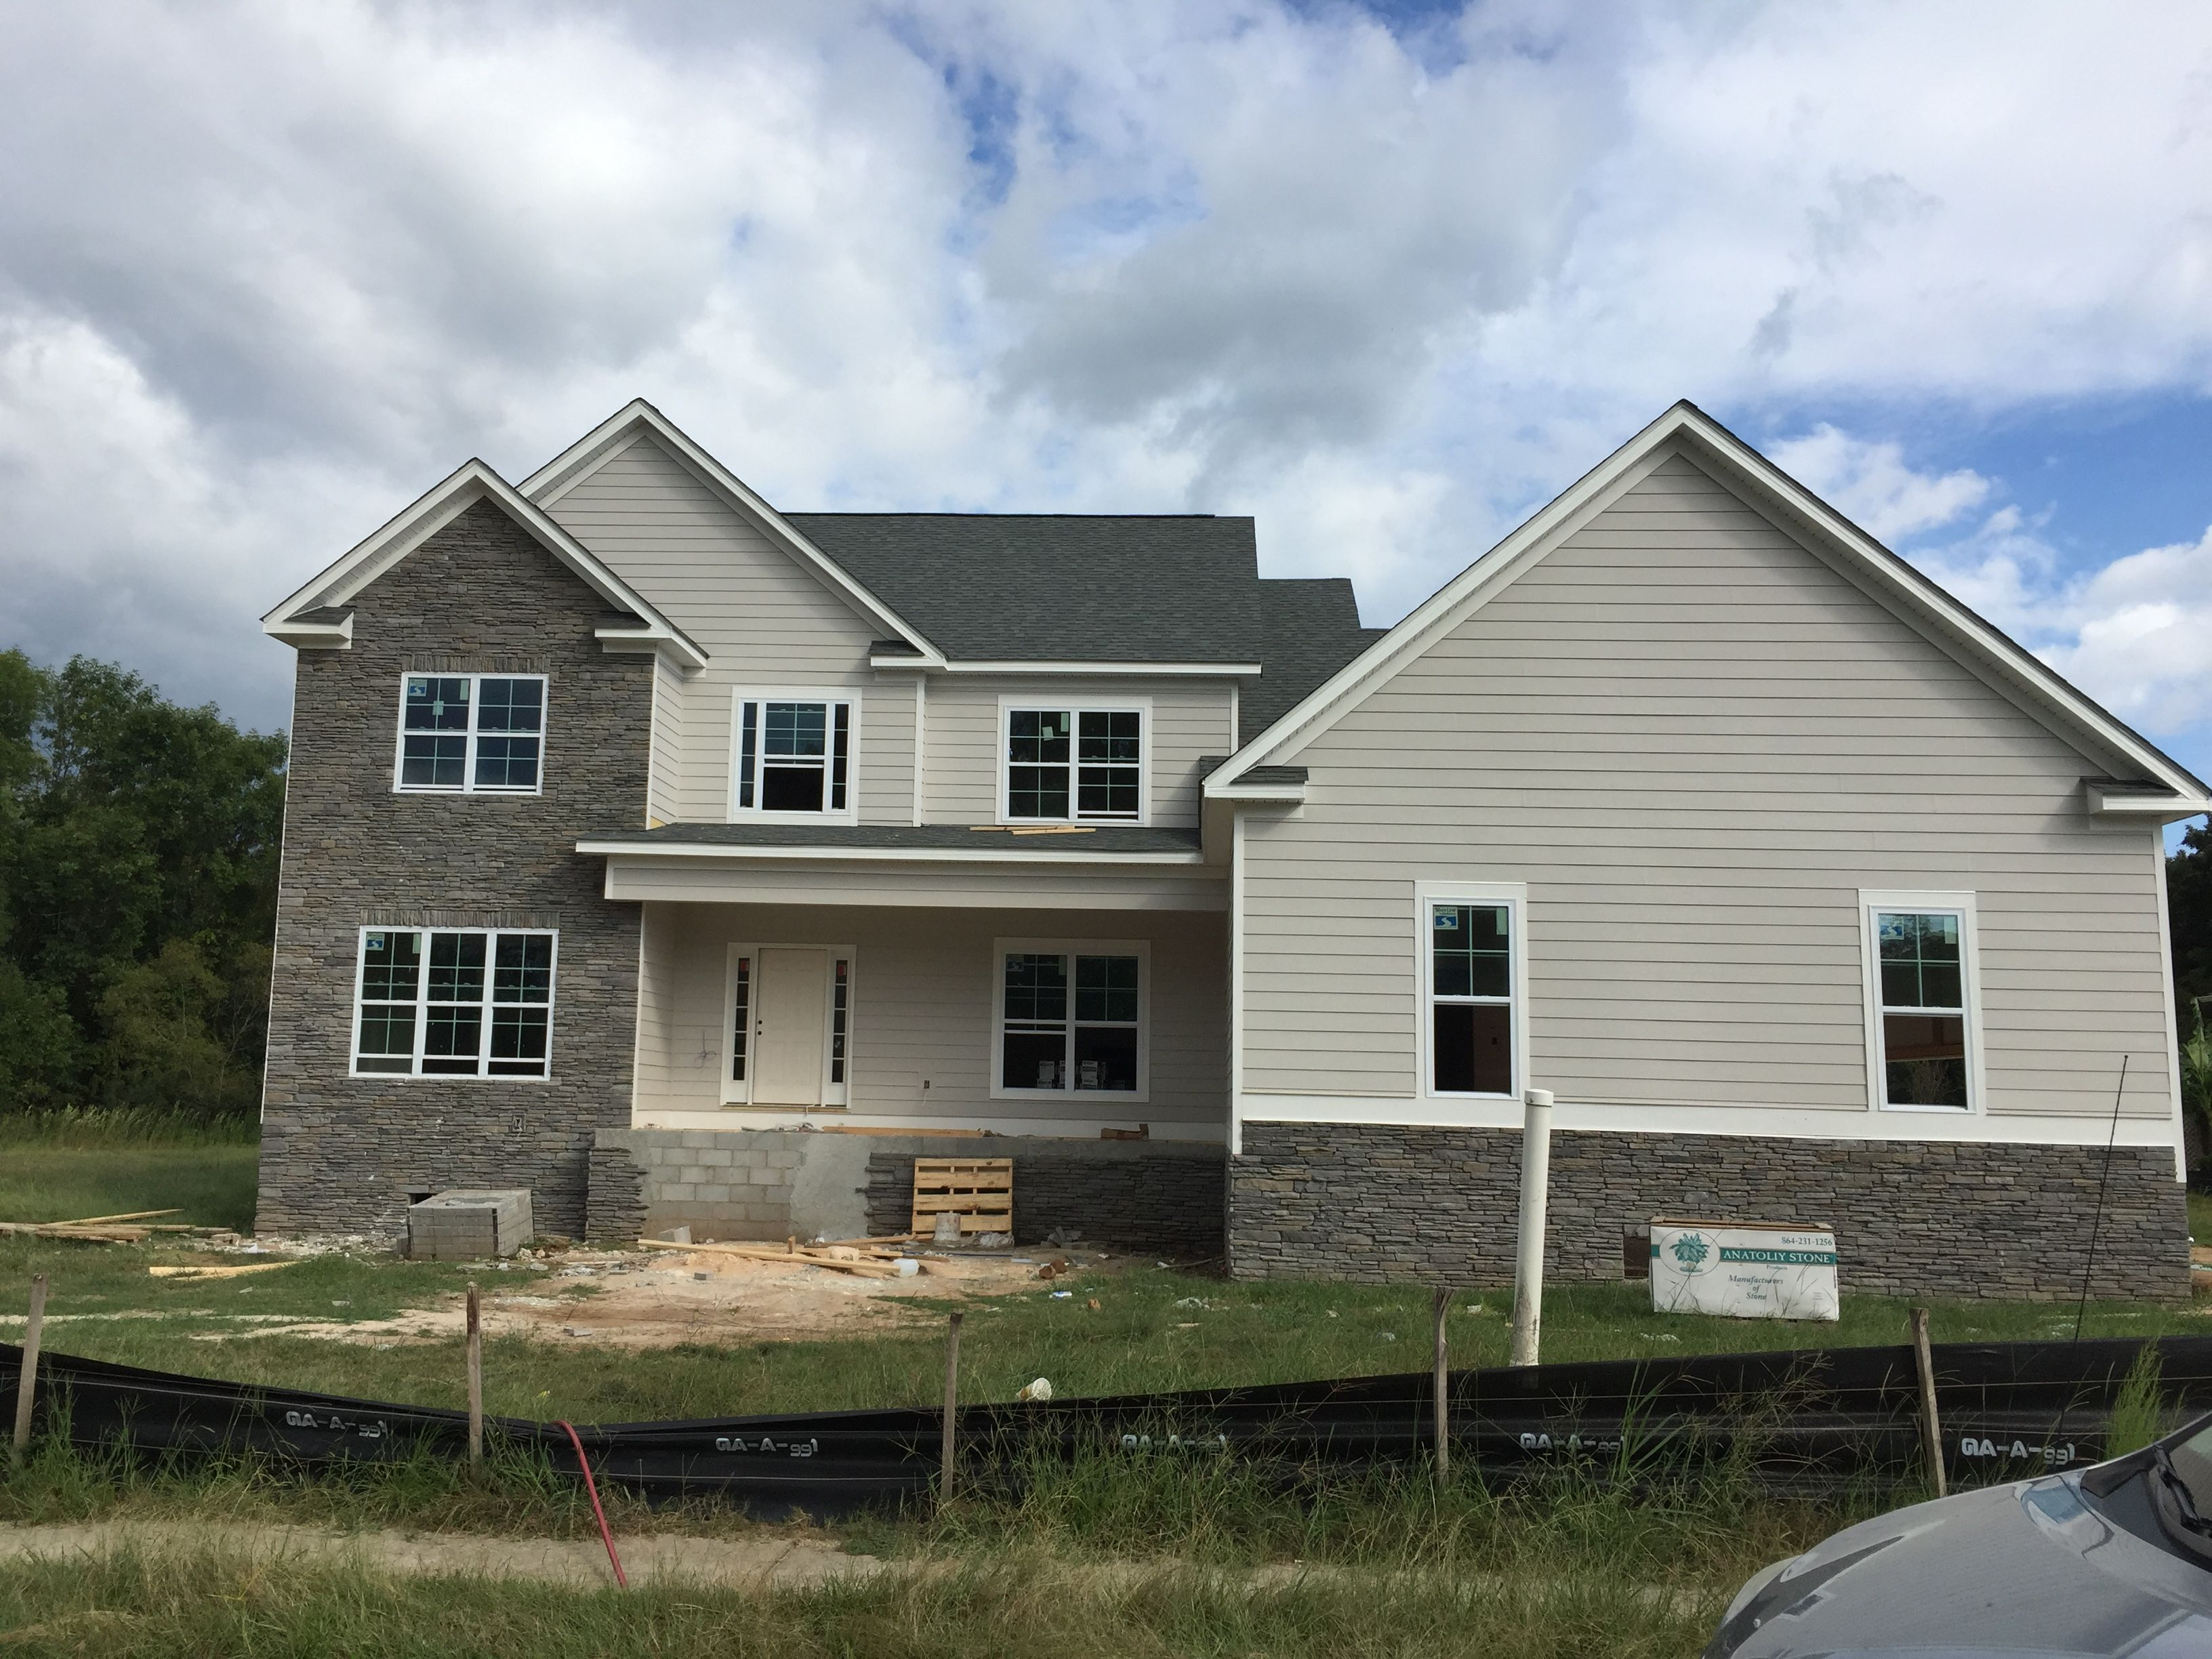 New House Is Coming Along. Sherwin Williams Alpaca With Gray Southeastern  Ledgestone. Bemalte HäuserAußen HäuserAußenfarbenHausfarbenSchmidtÄußeres  ...